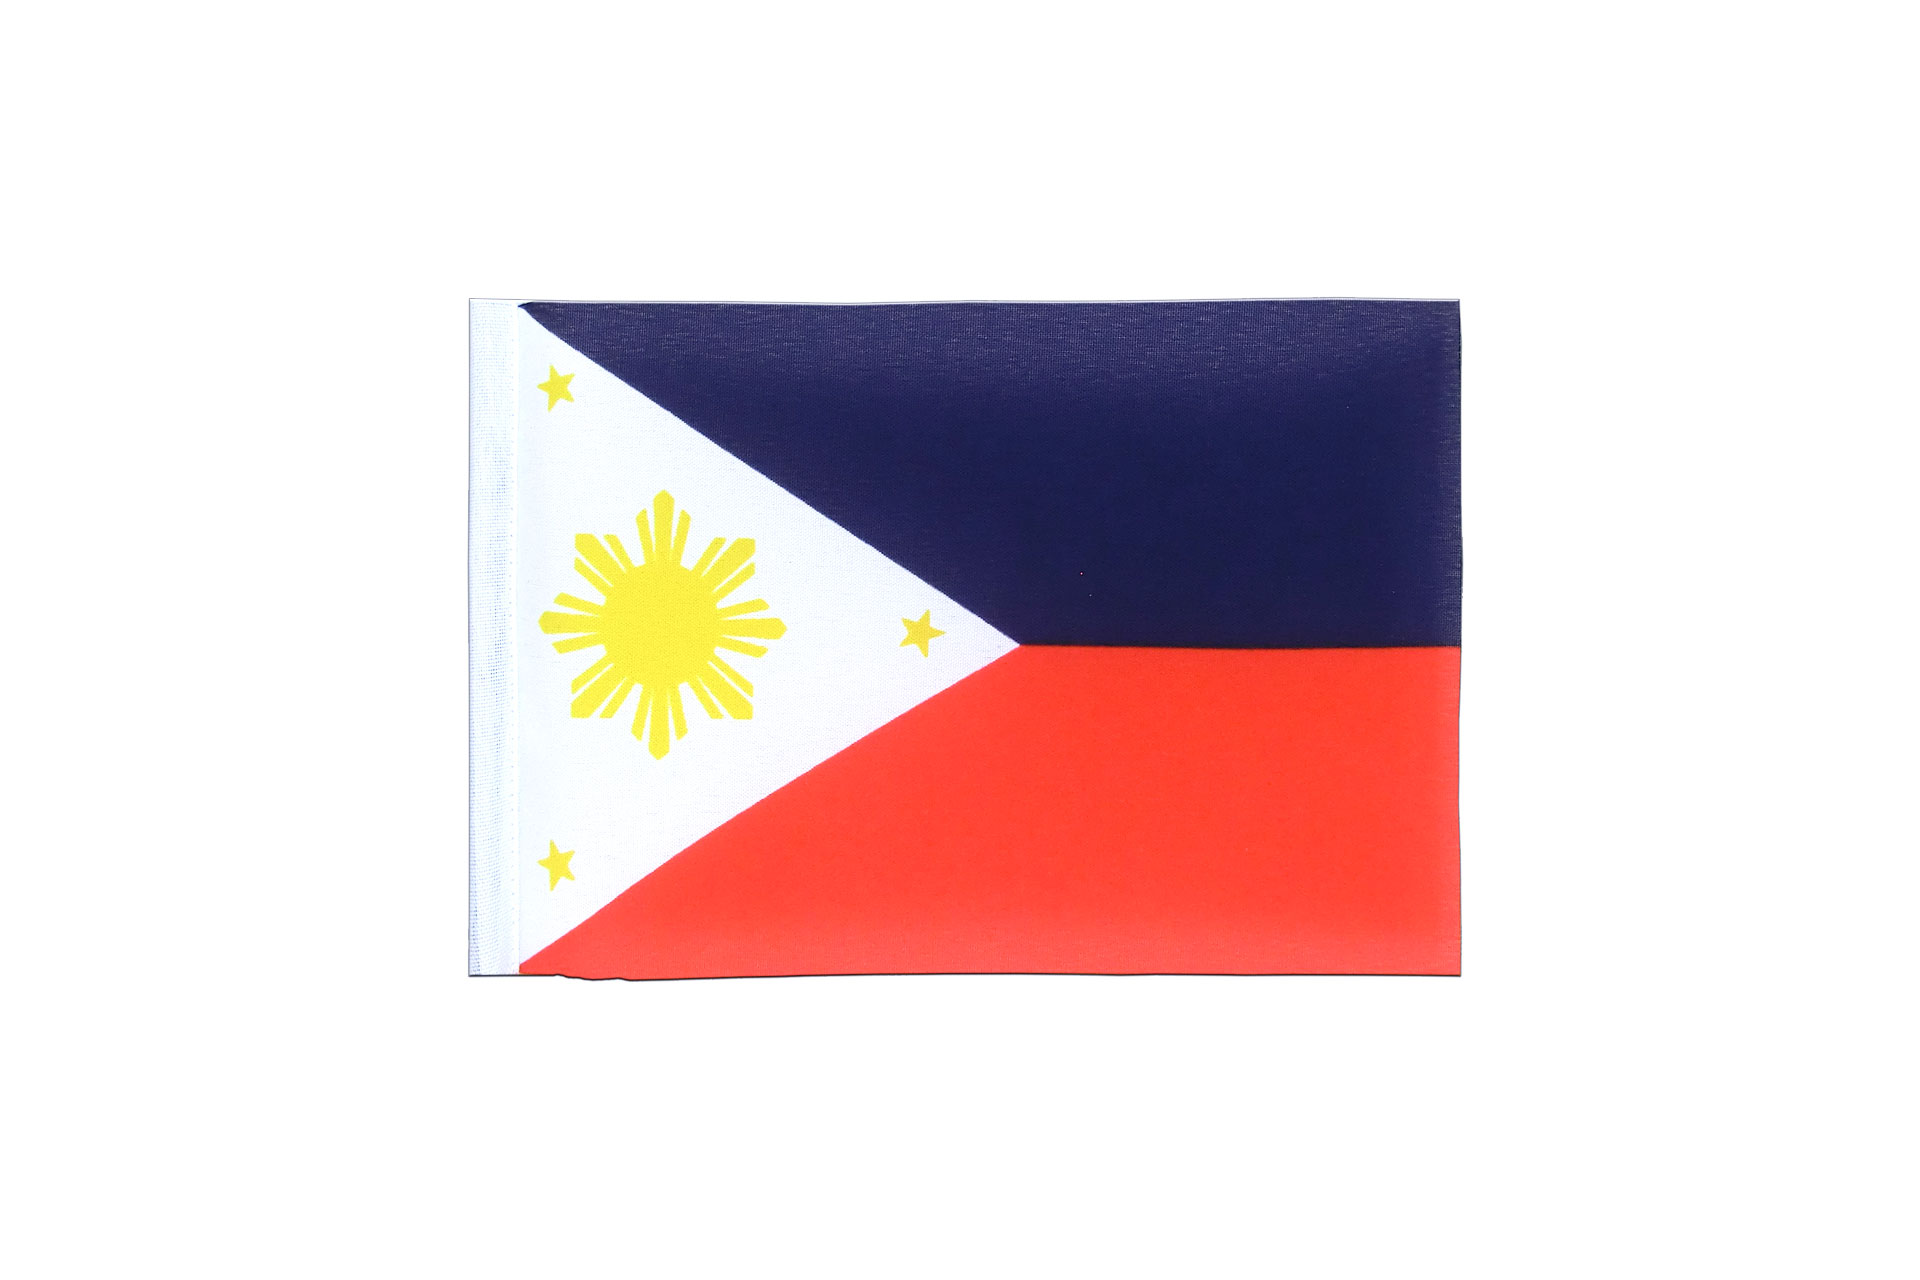 Mini flag philippines 4x6 royal flags mini flag philippines 4x6 buycottarizona Images